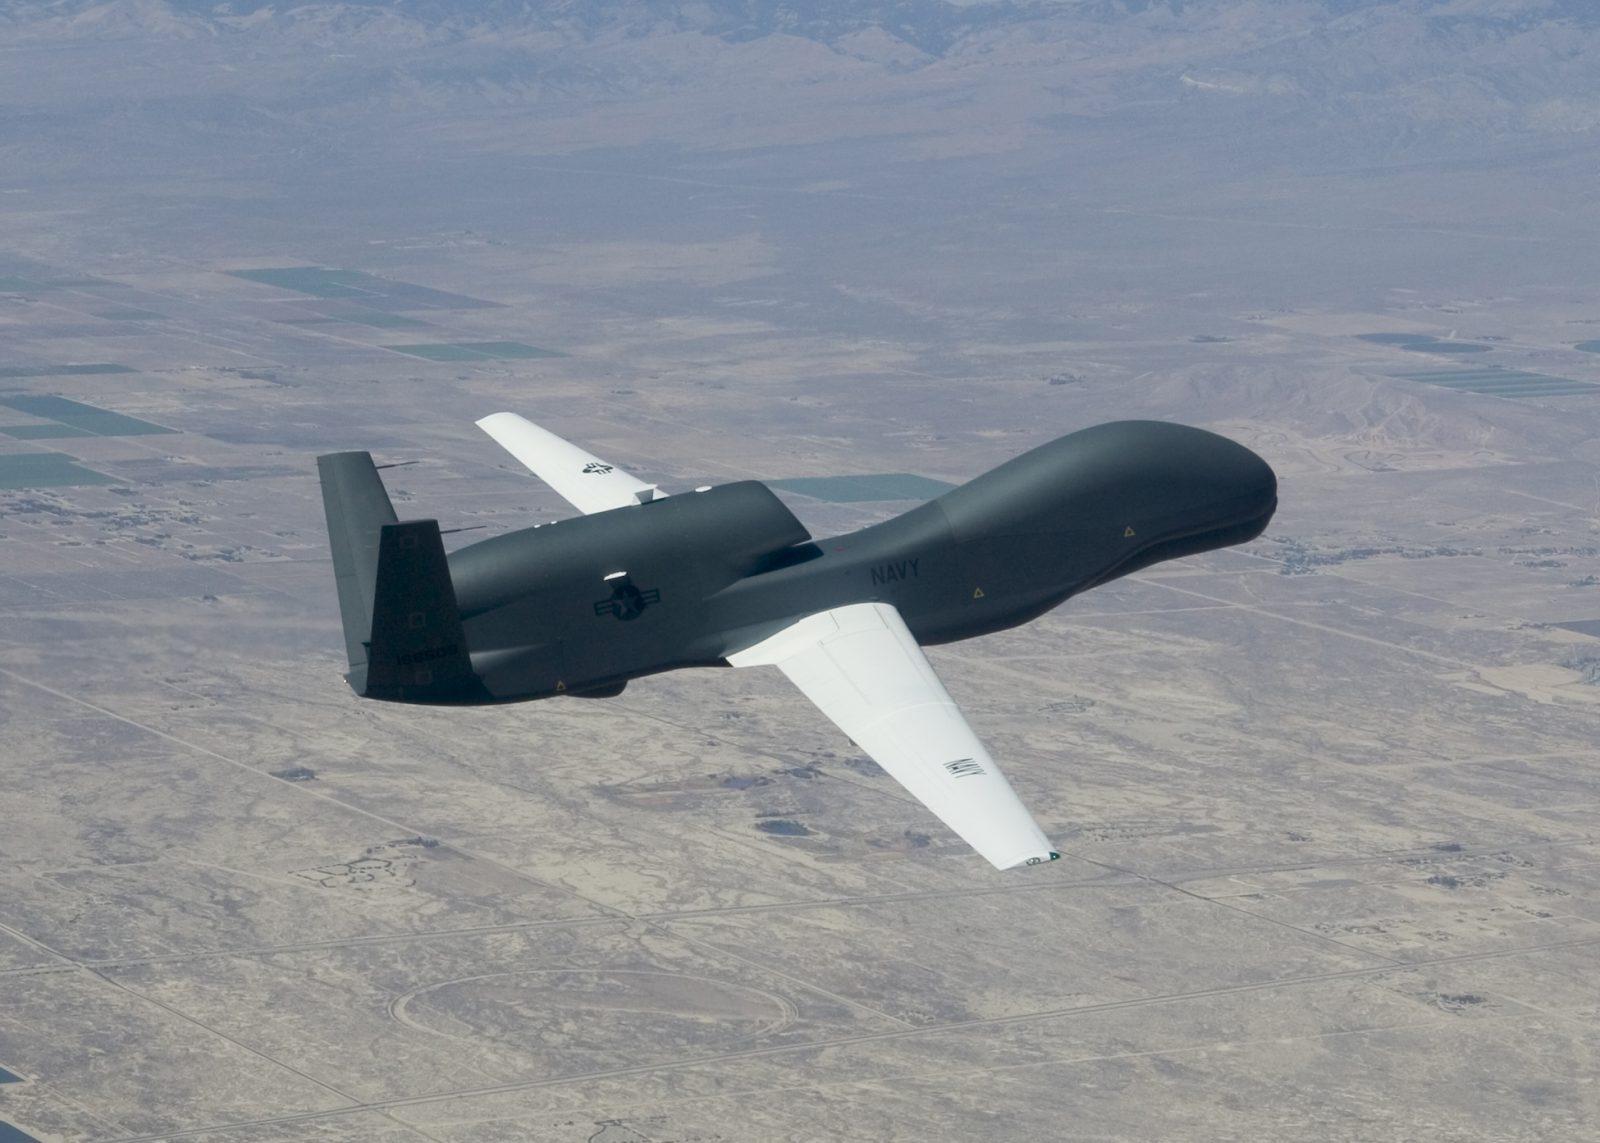 Decrease in cost per flight hour by Northrop Grumman RQ-4 Global Hawk